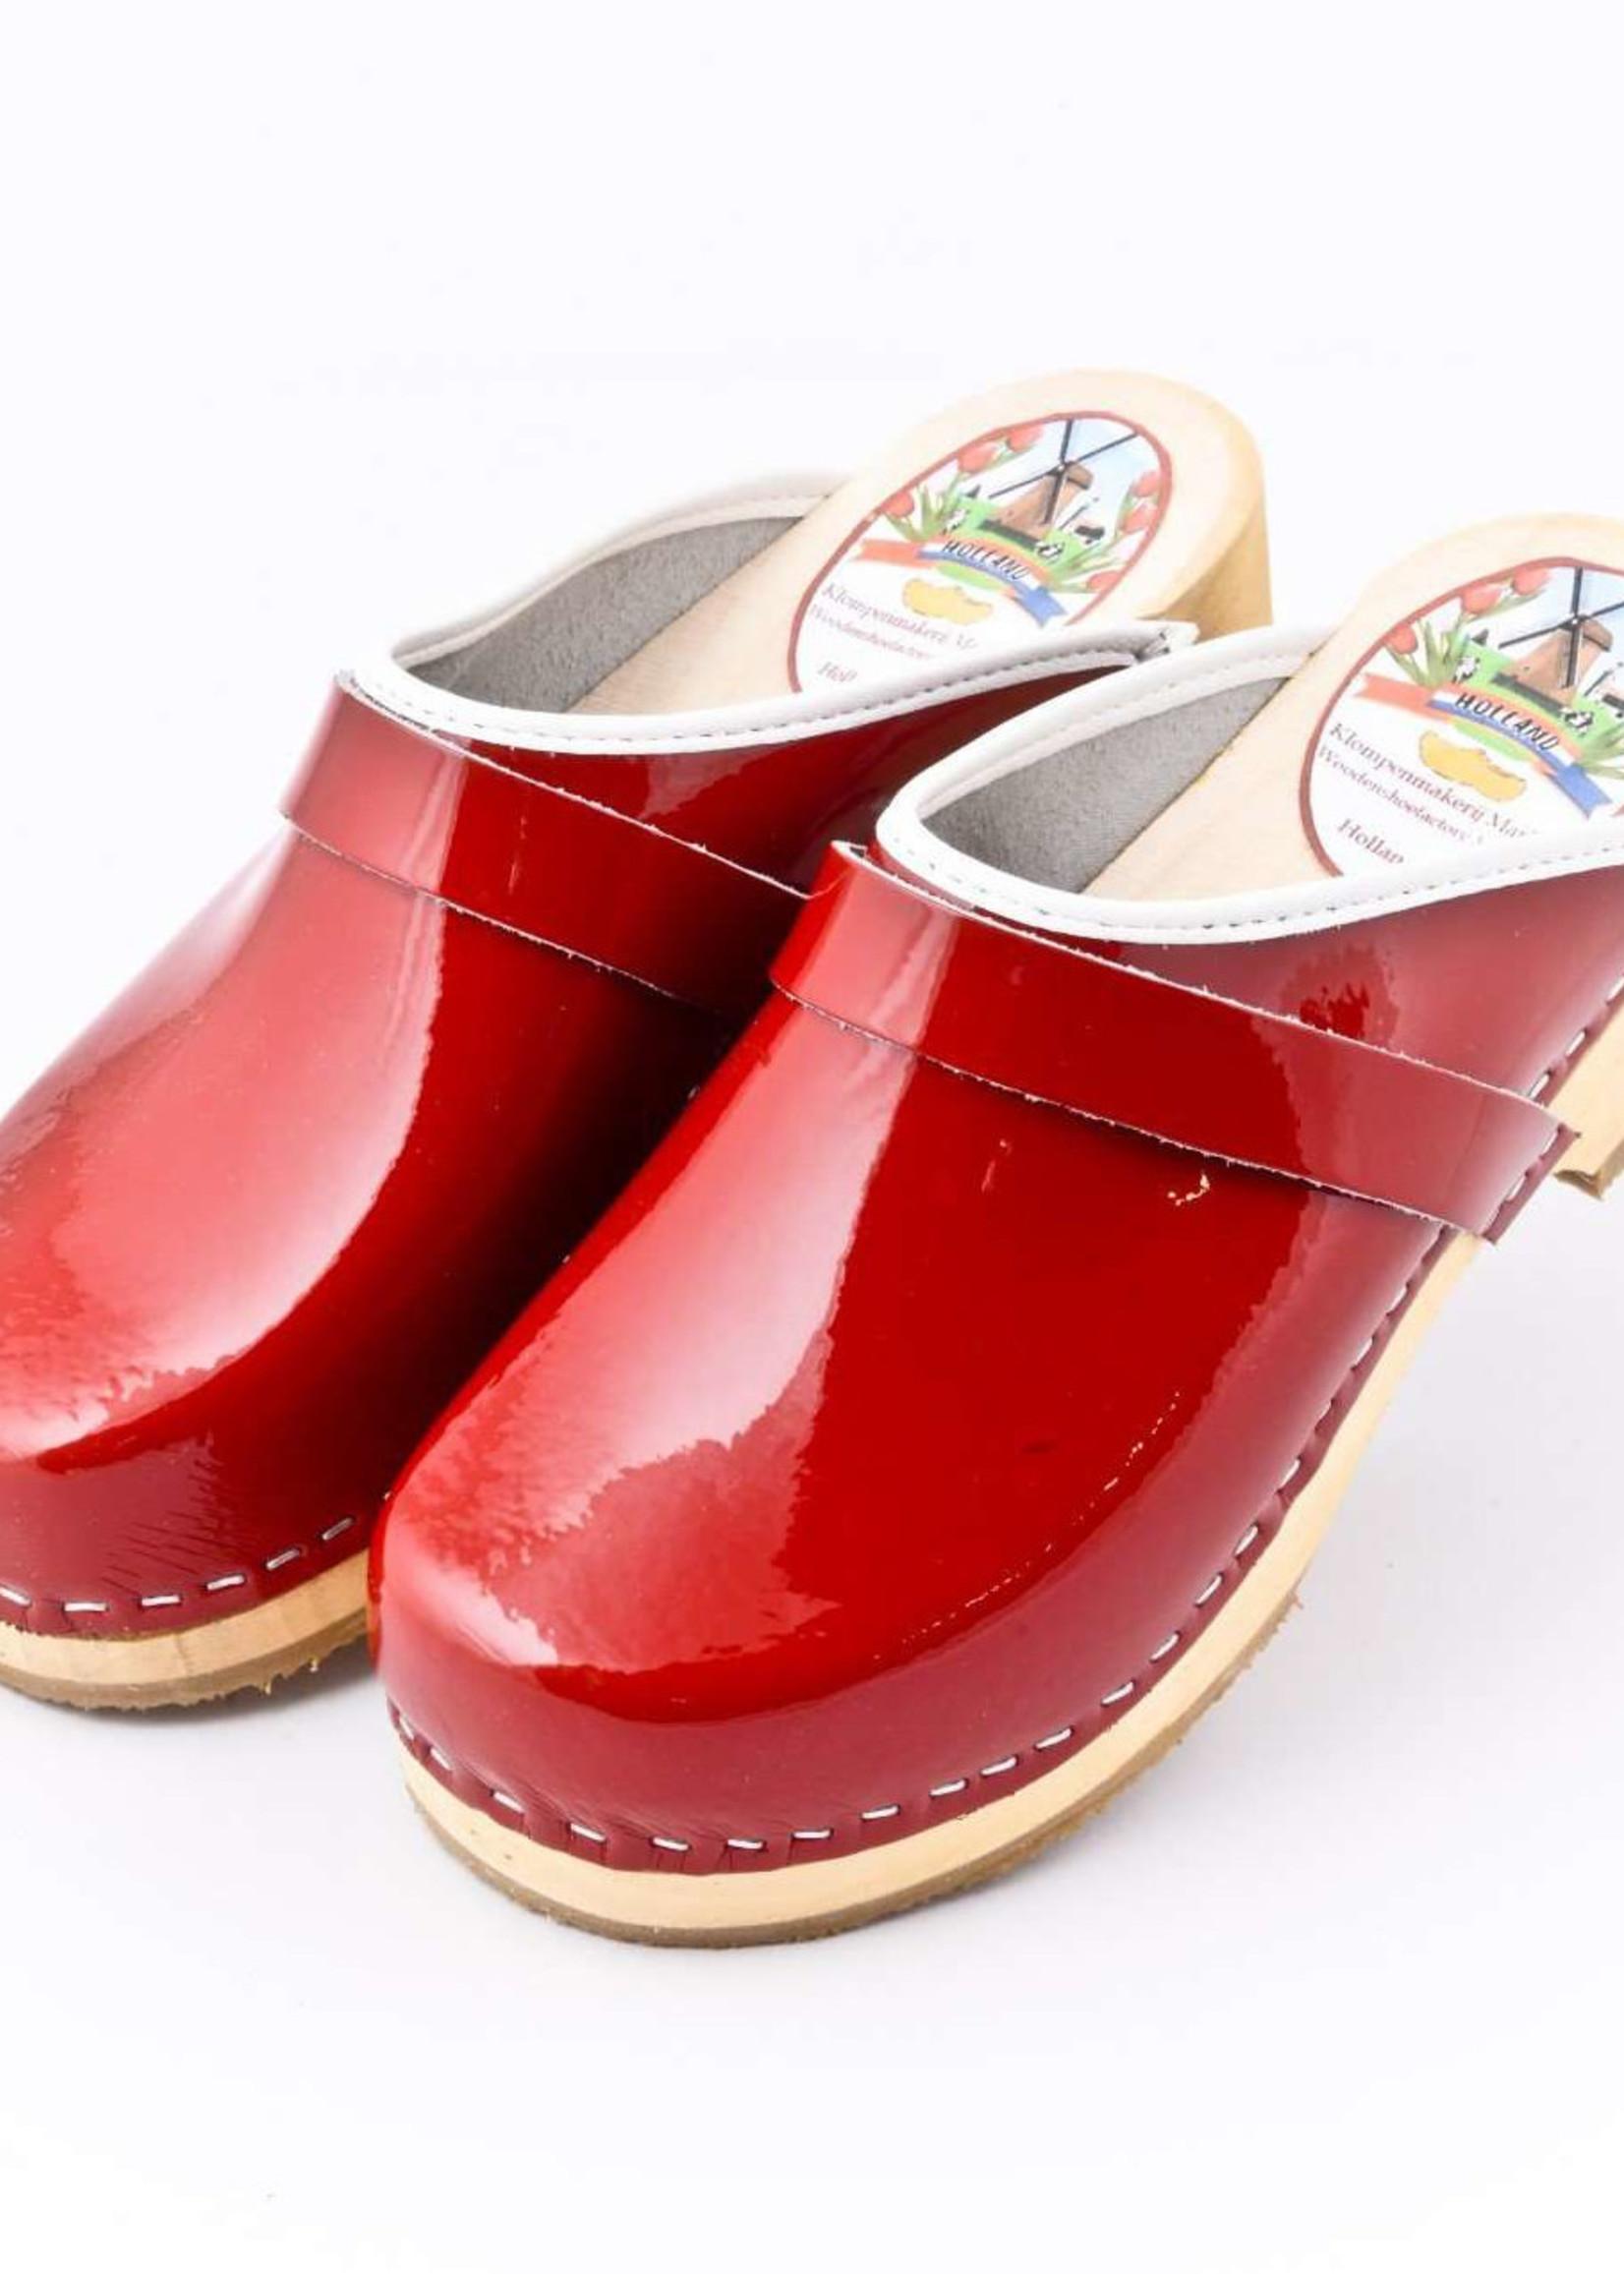 Simson Leather Clogs,  Shiny Black, Orthepedic Footwear